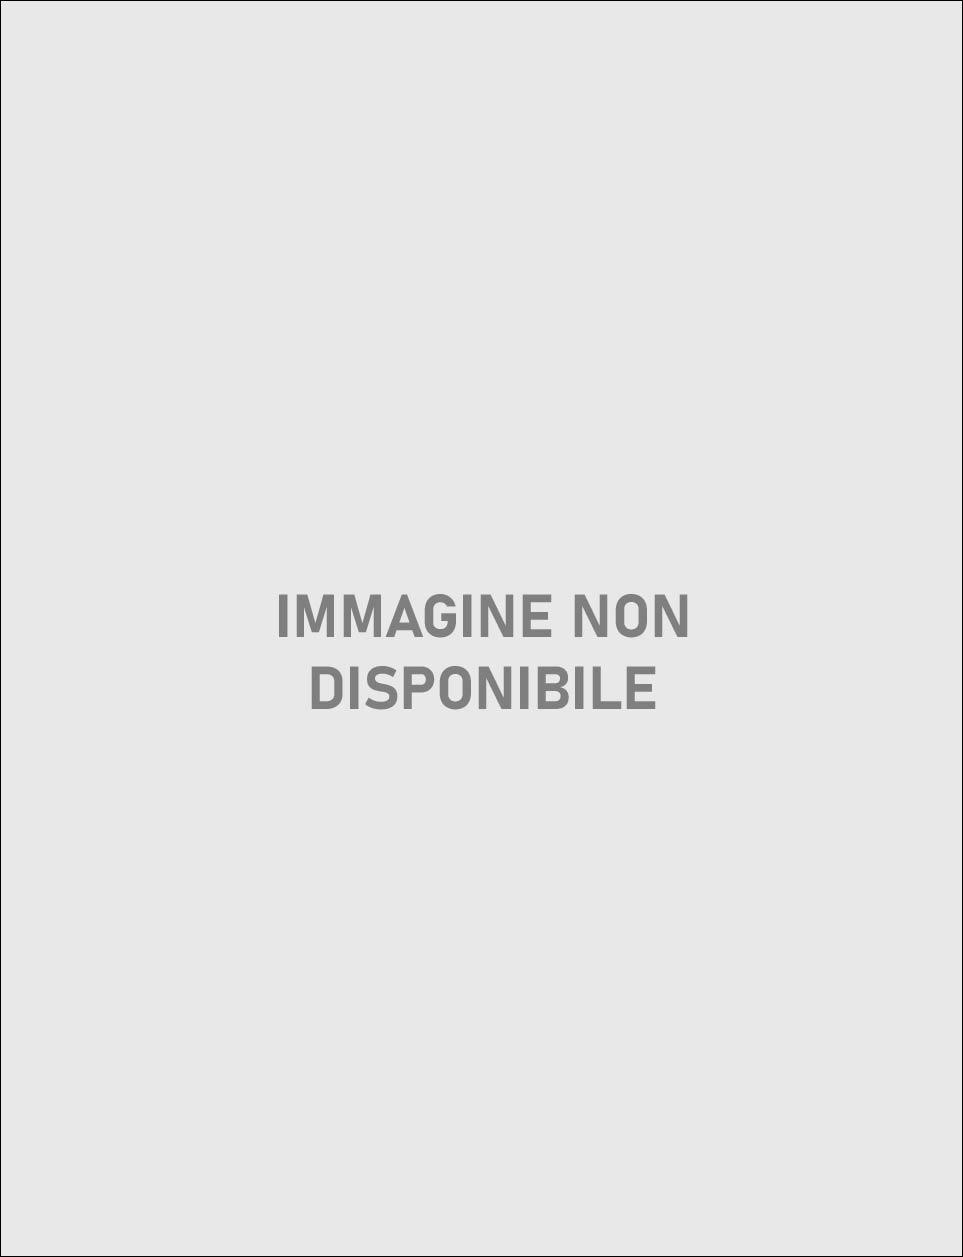 Pantaloni sportivicoloreBlu bianco